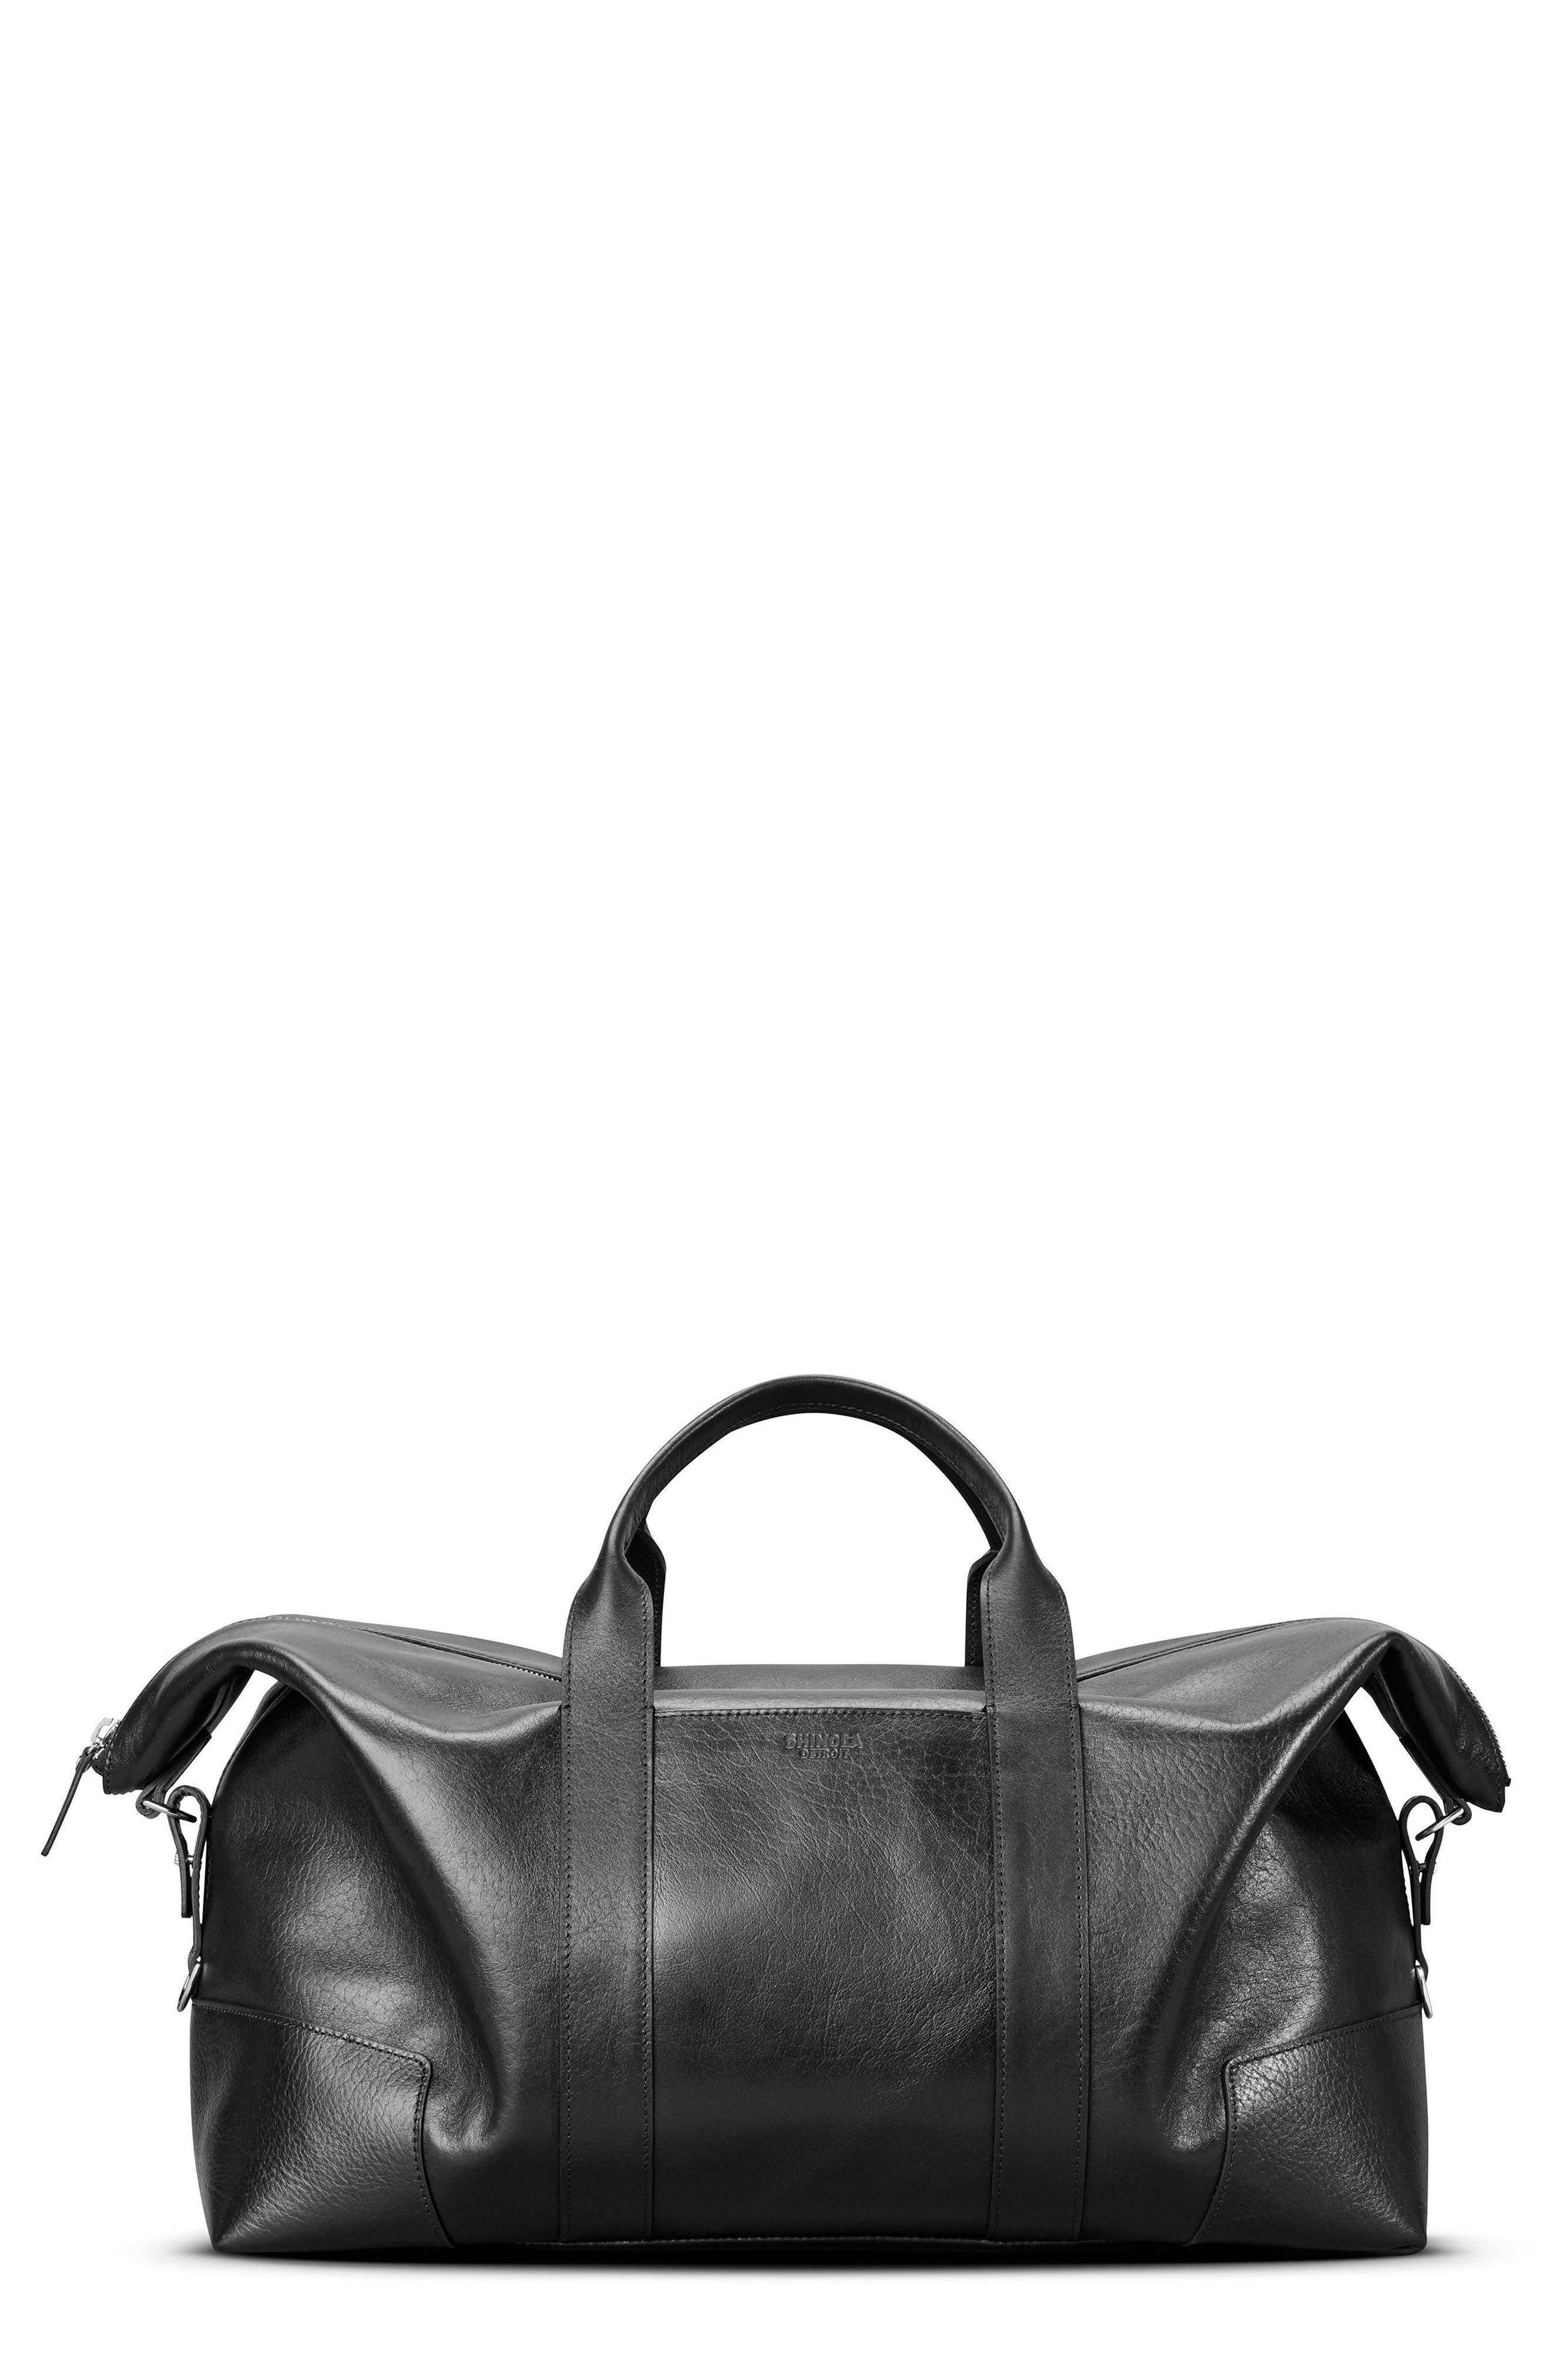 Alternate Image 1 Selected - Shinola Signature Leather Duffel Bag